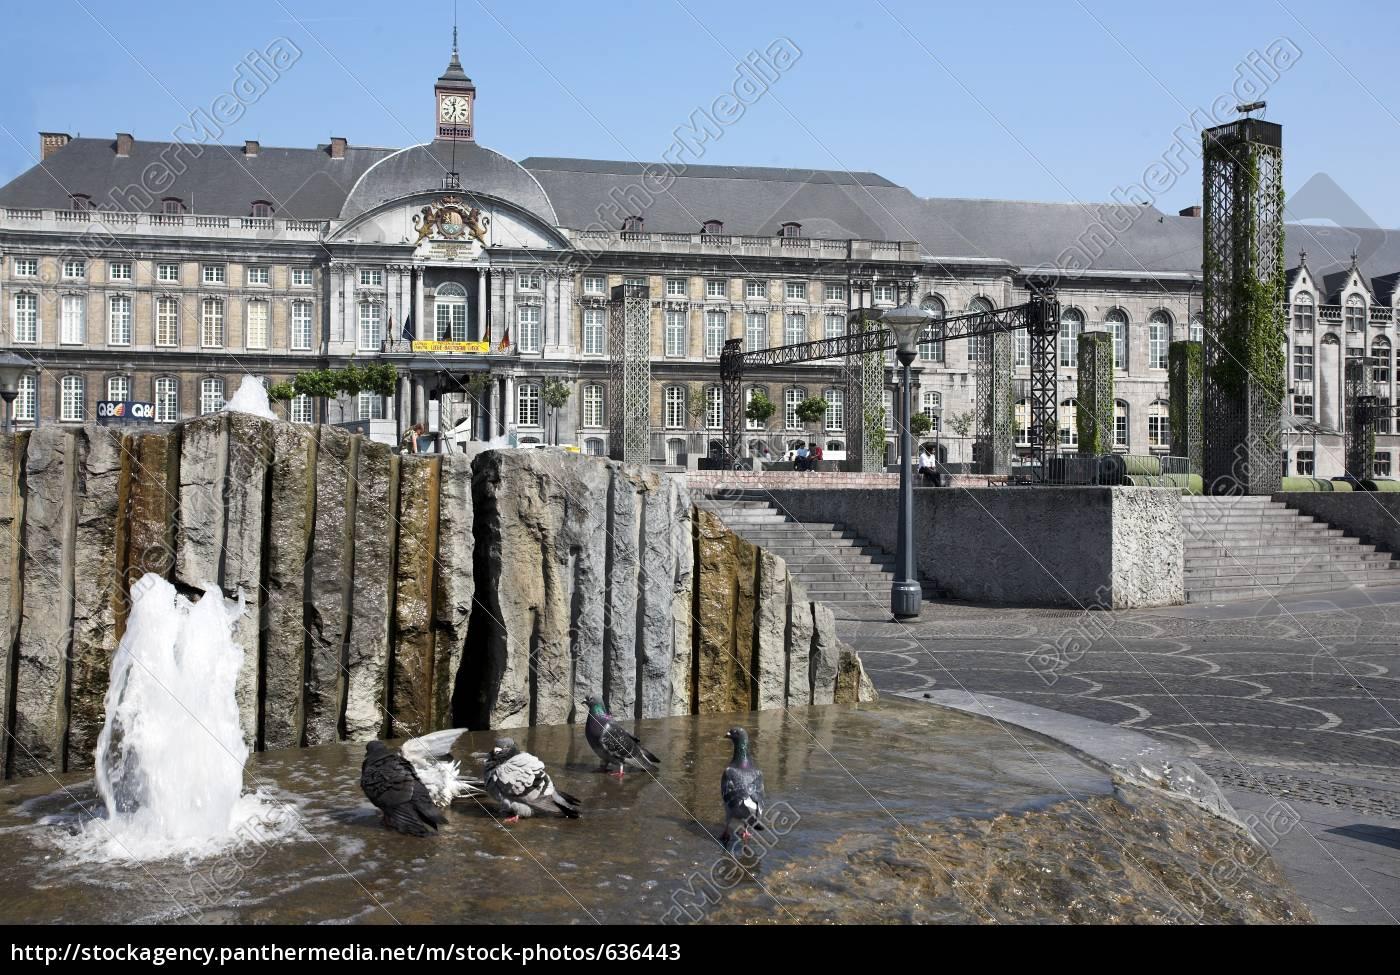 liege, -, palais, of, the, prince - 636443